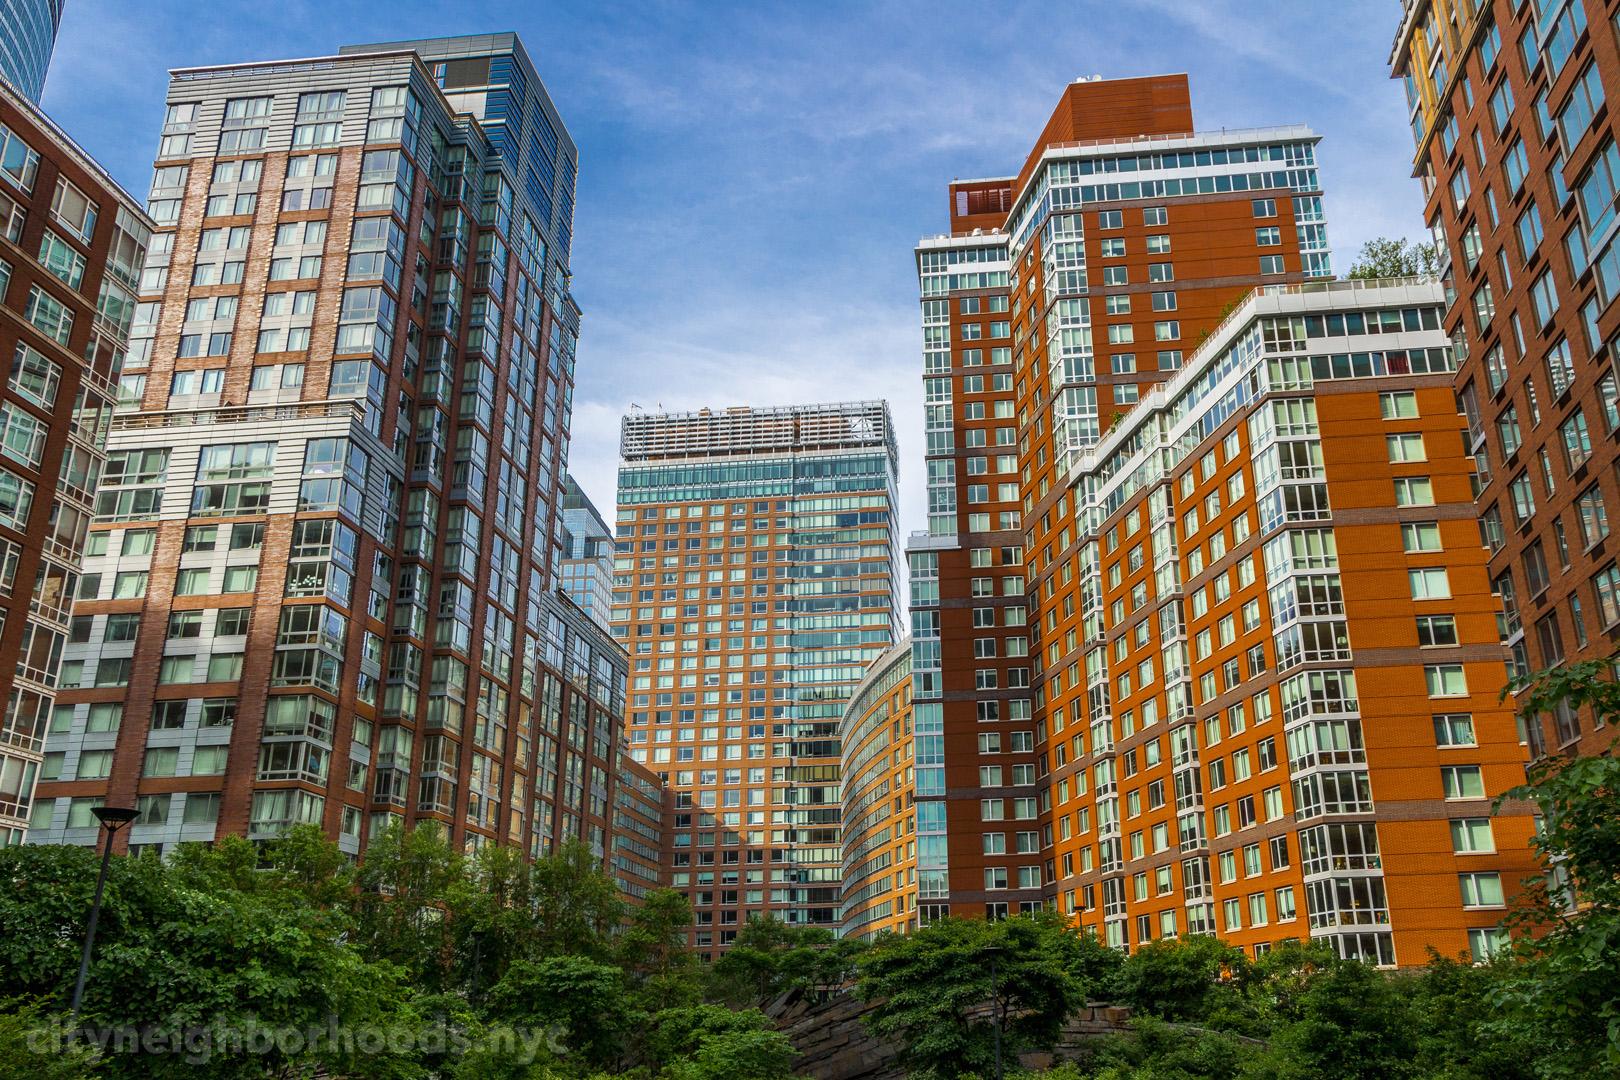 Teardrop Park - Battery Park City - Lower Manhattan - NYC